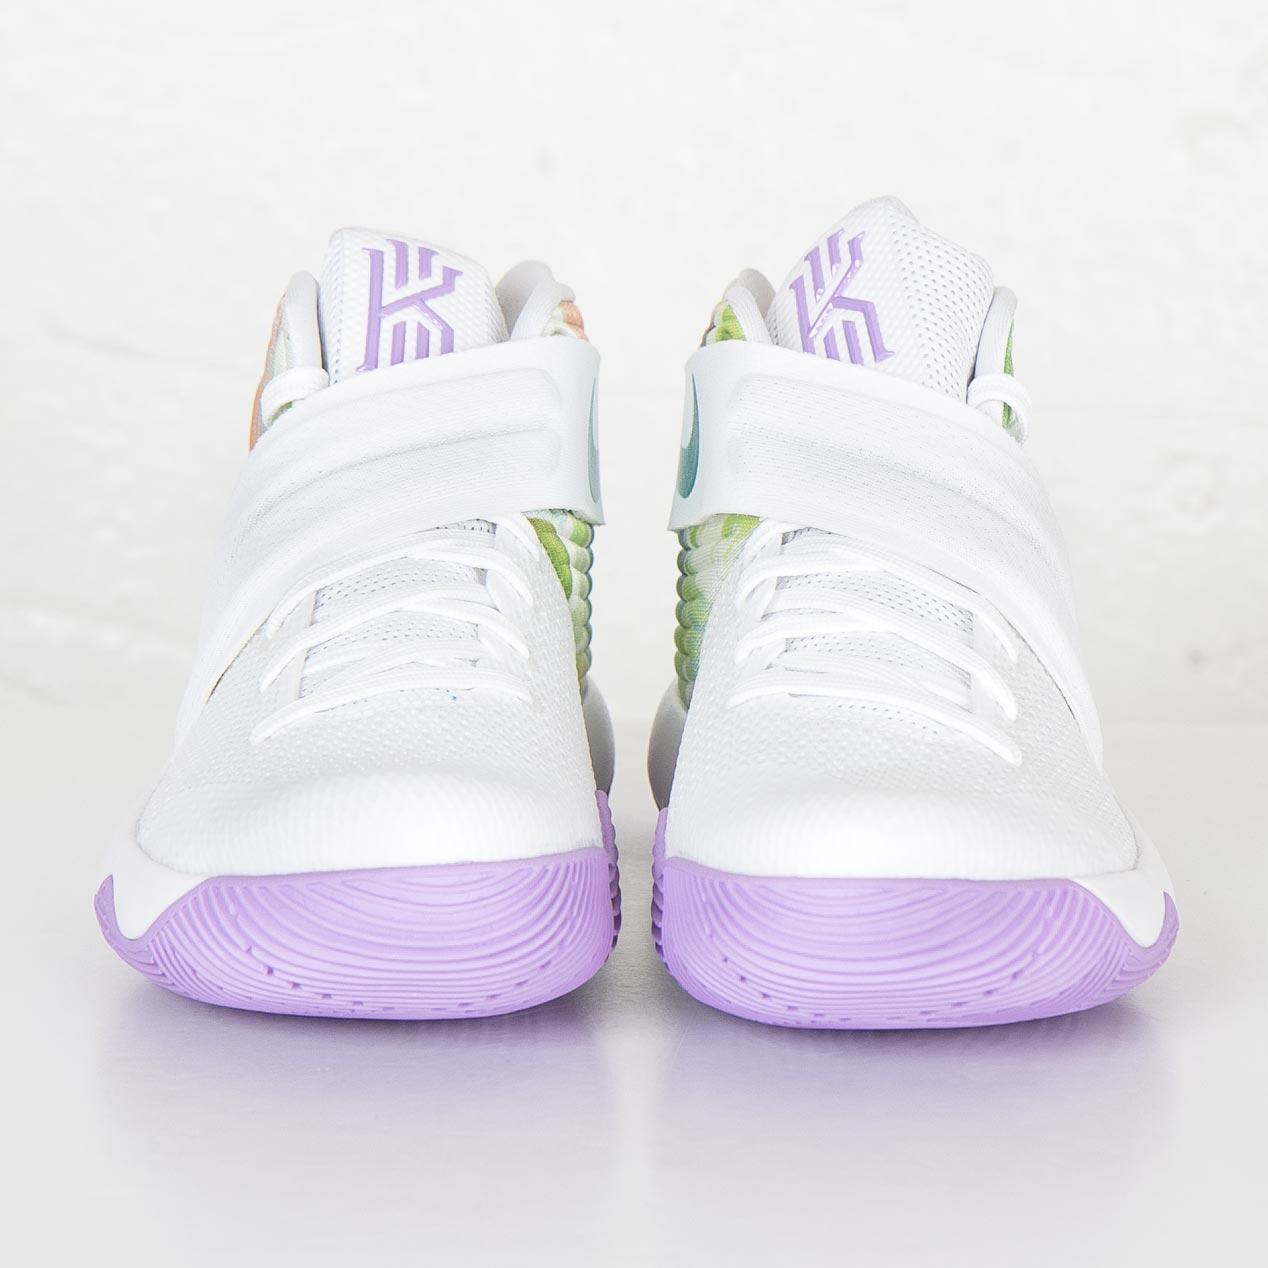 0607cbb20a2928 Nike Kyrie 2 - 819583-105 - Sneakersnstuff